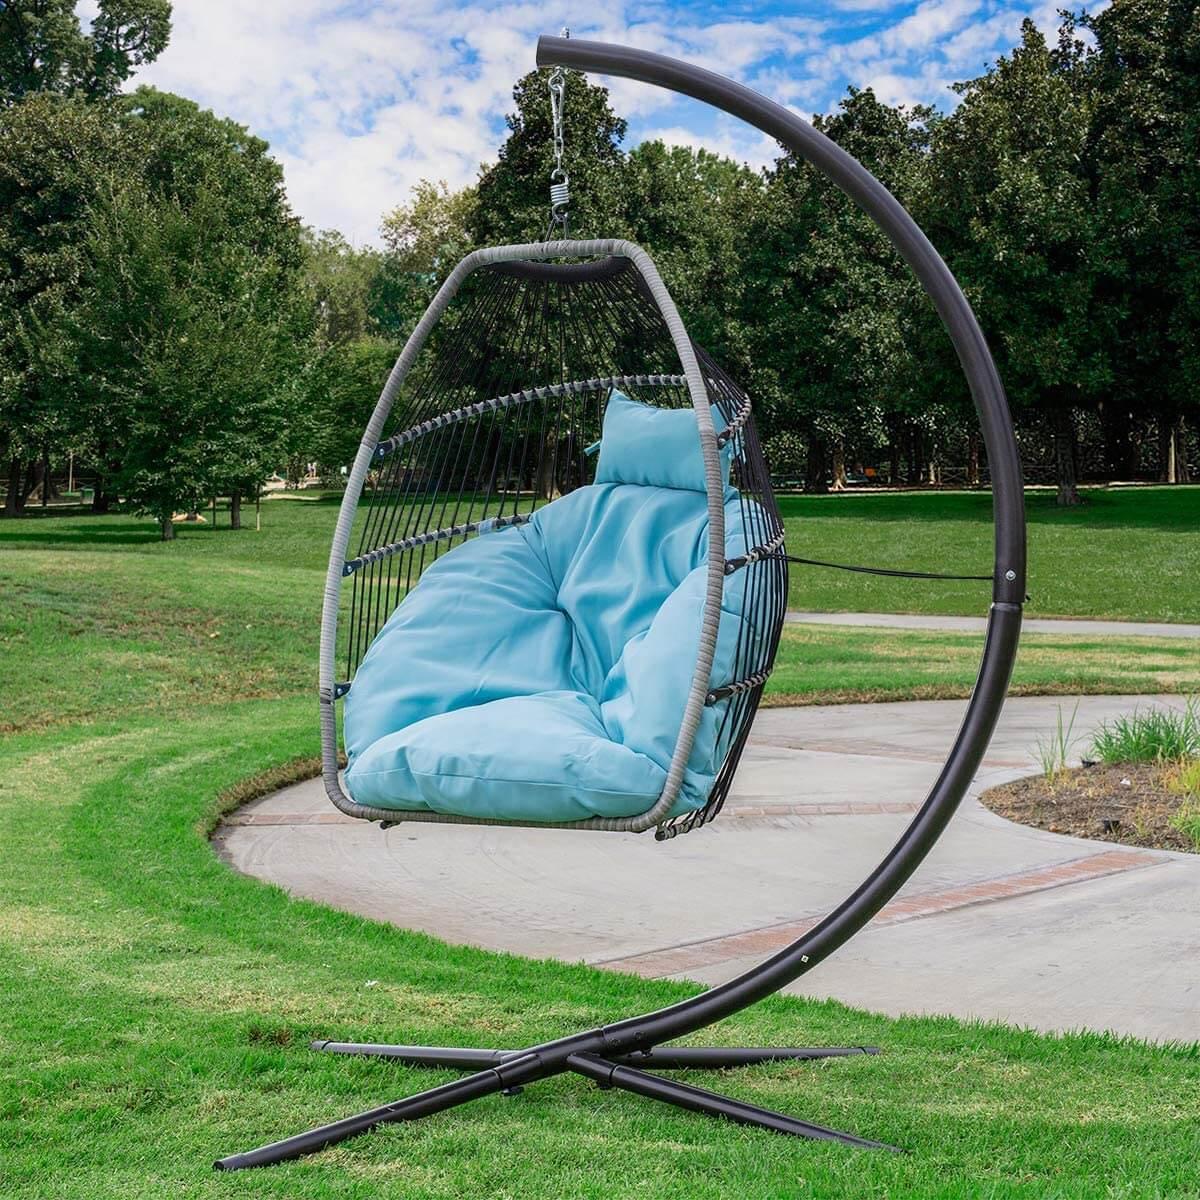 Deluxe Hanging Egg Chair Swing